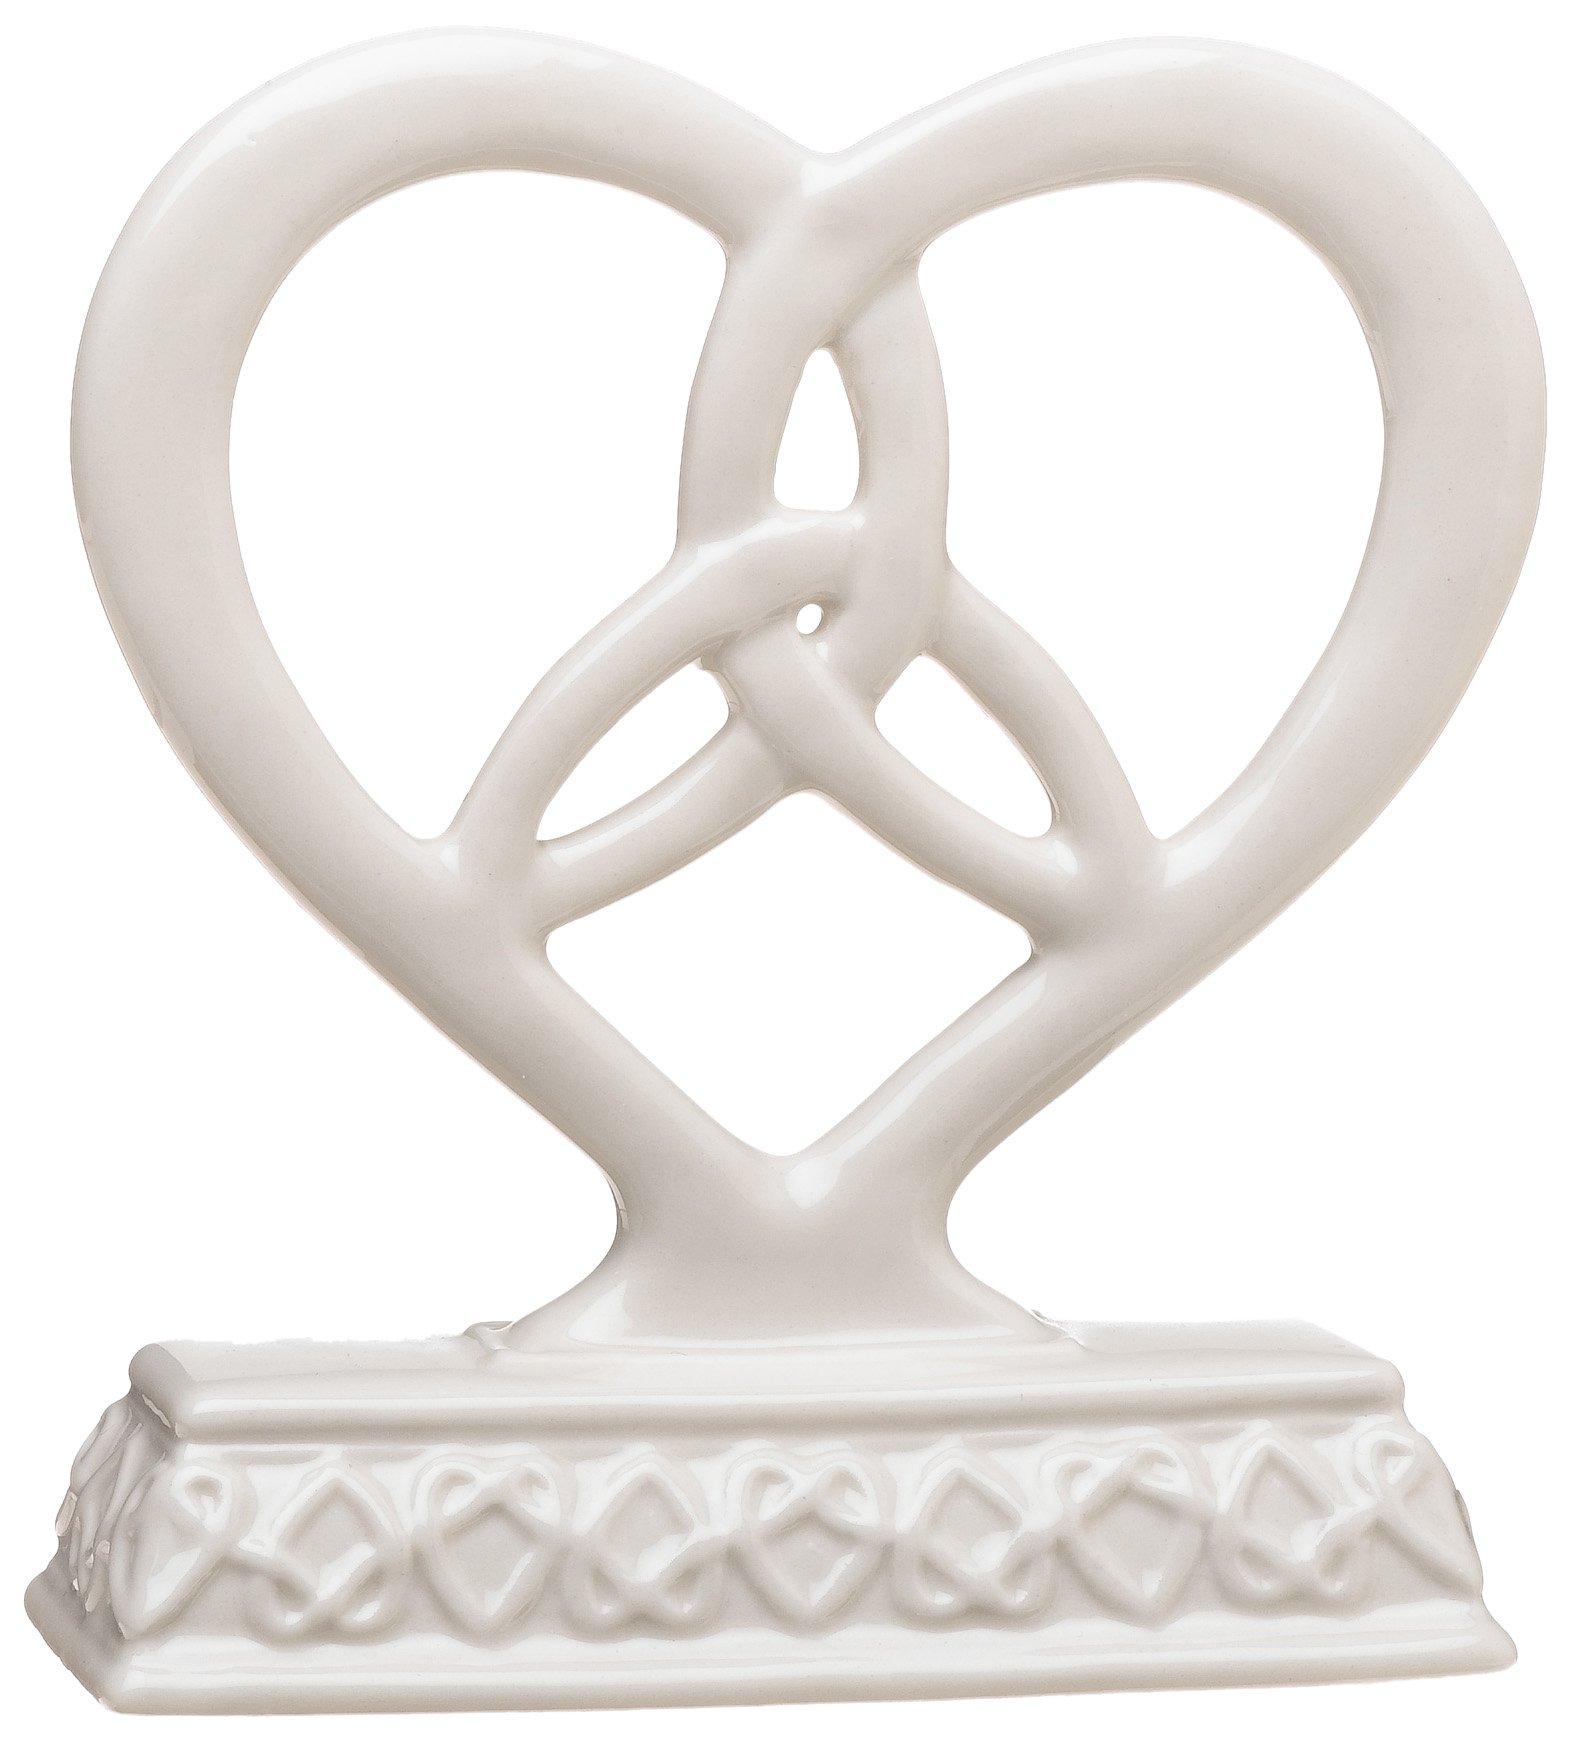 Weddingstar Heart Framed Trinity Knot Cake Top